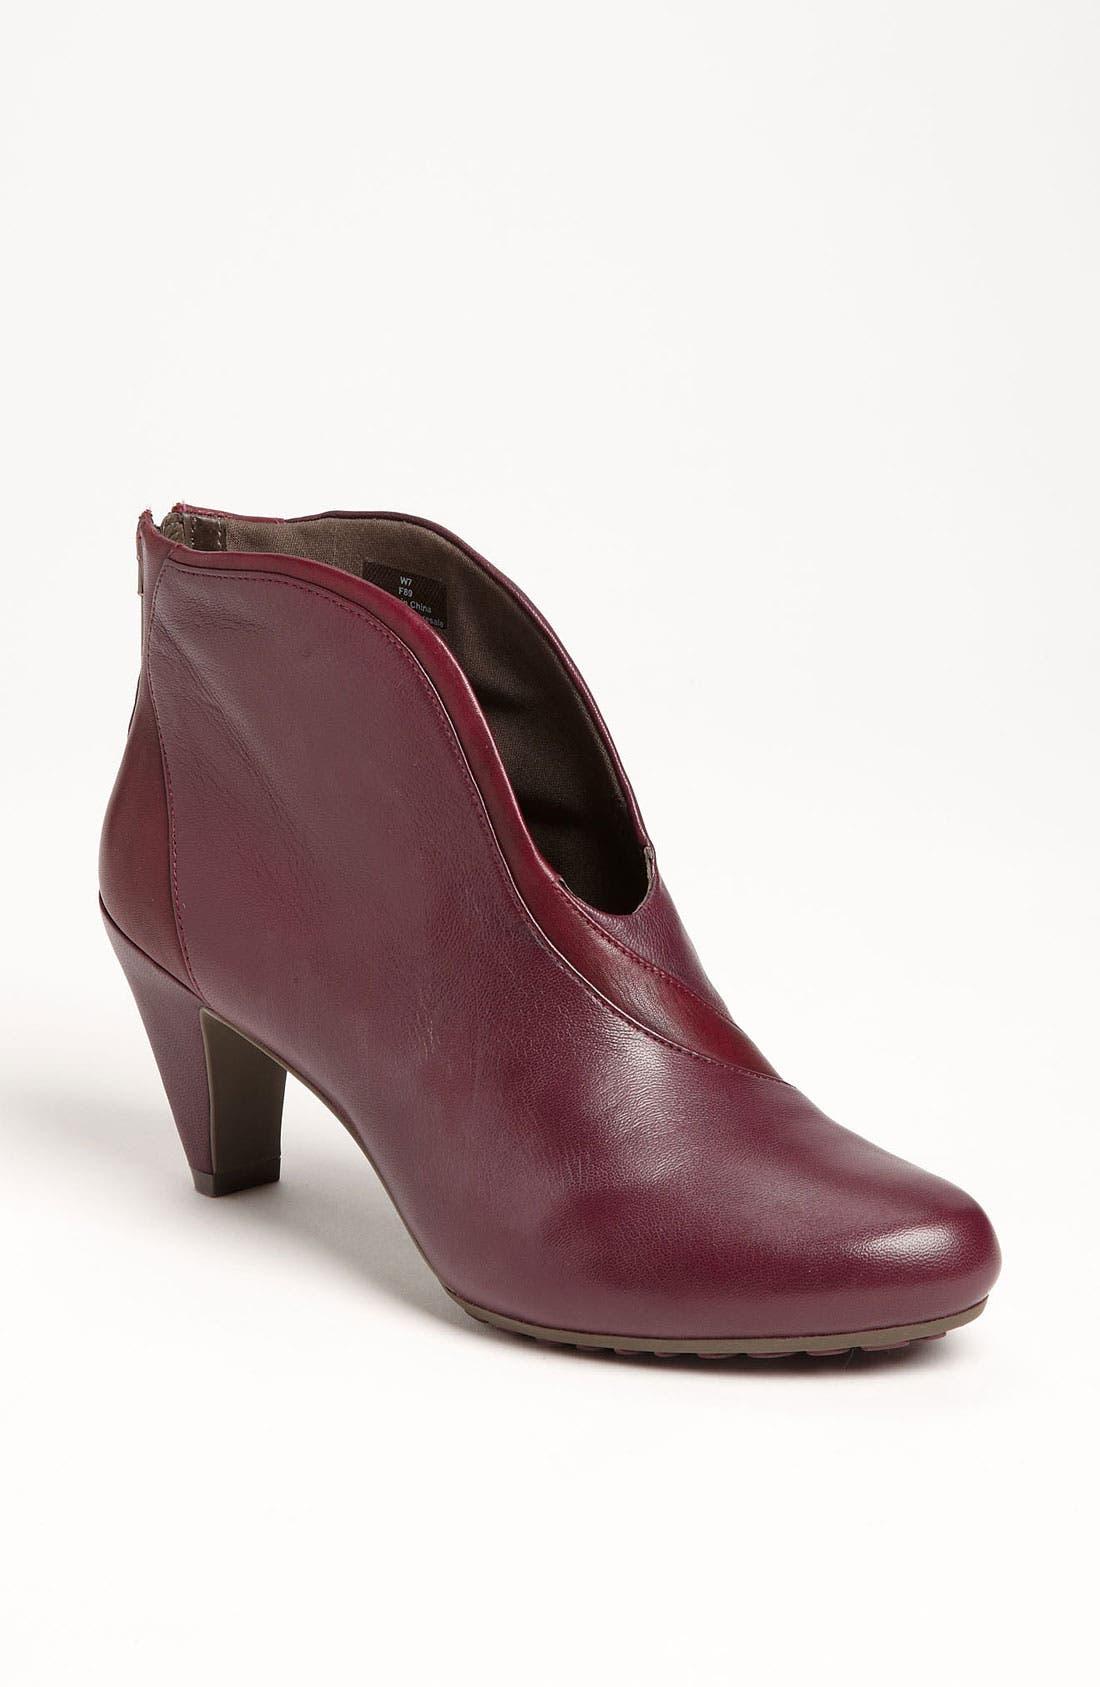 Alternate Image 1 Selected - Tsubo 'Myla' Boot